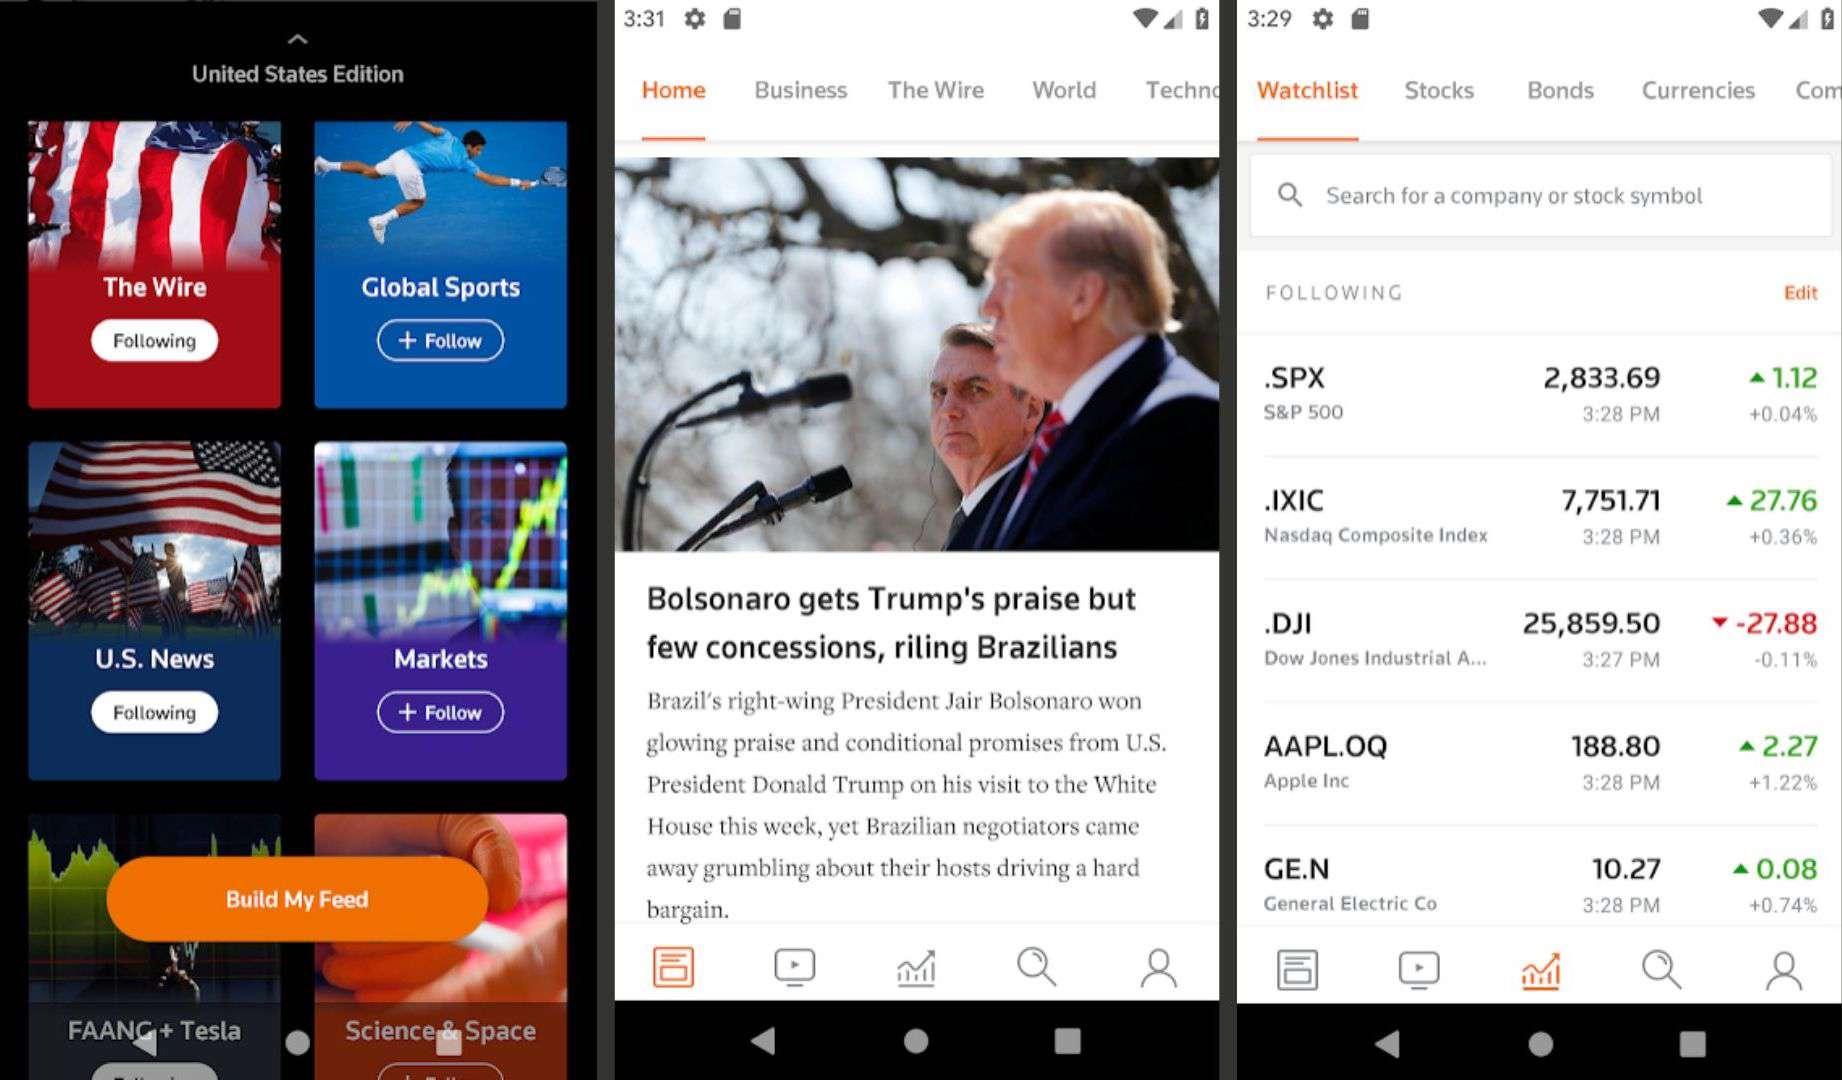 Three screenshots of the Reuters app.